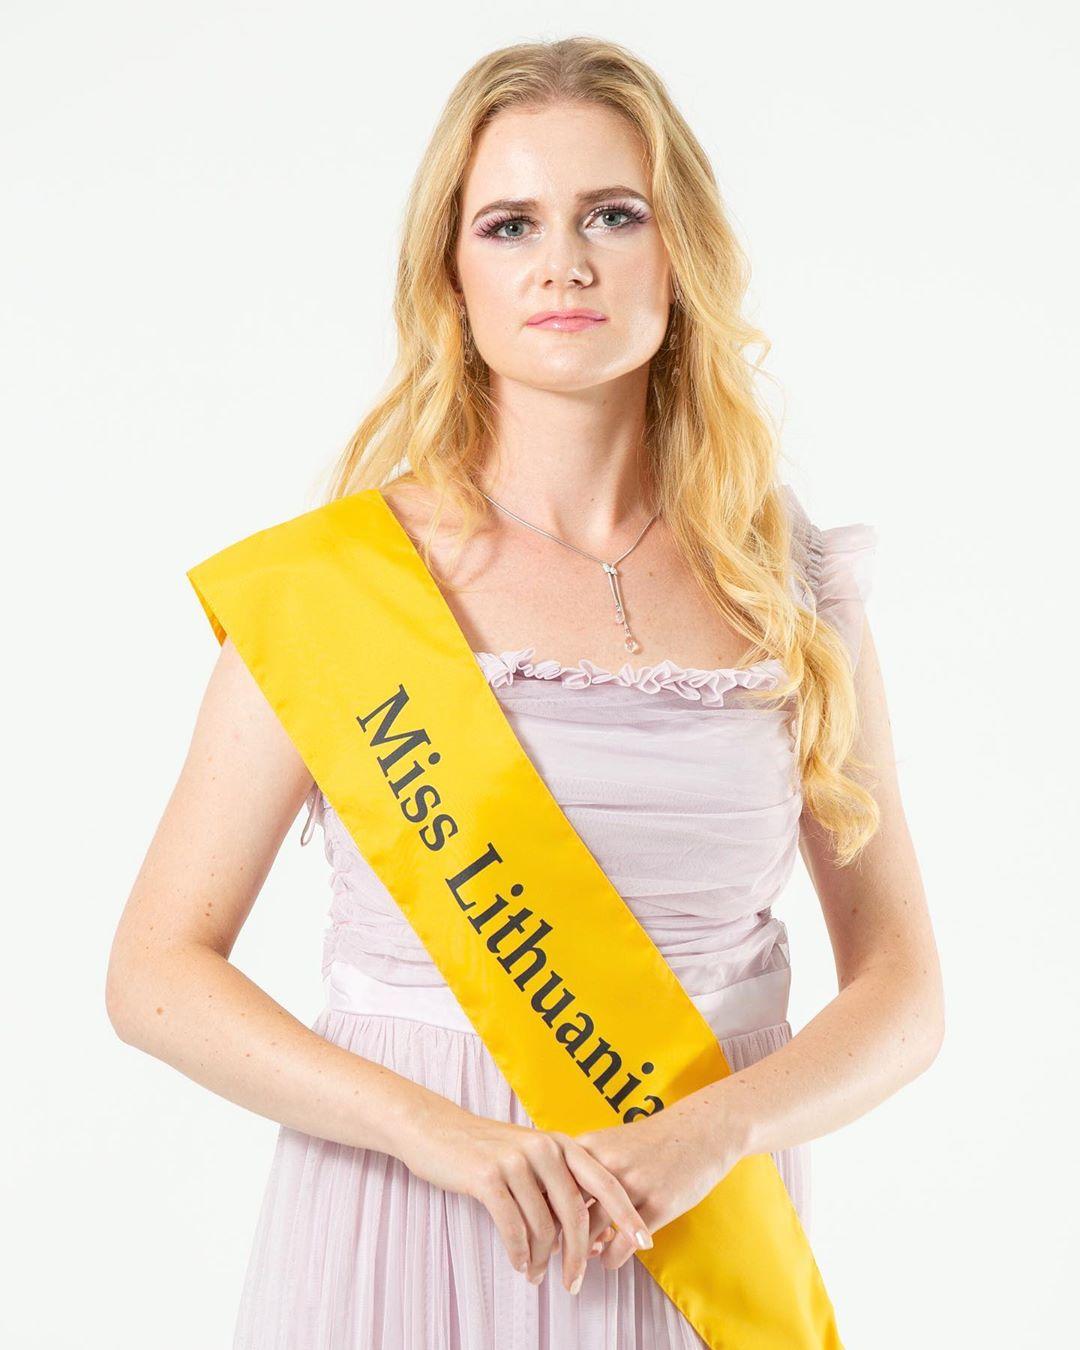 miss latvia vence miss great 2019. 1kOC9h